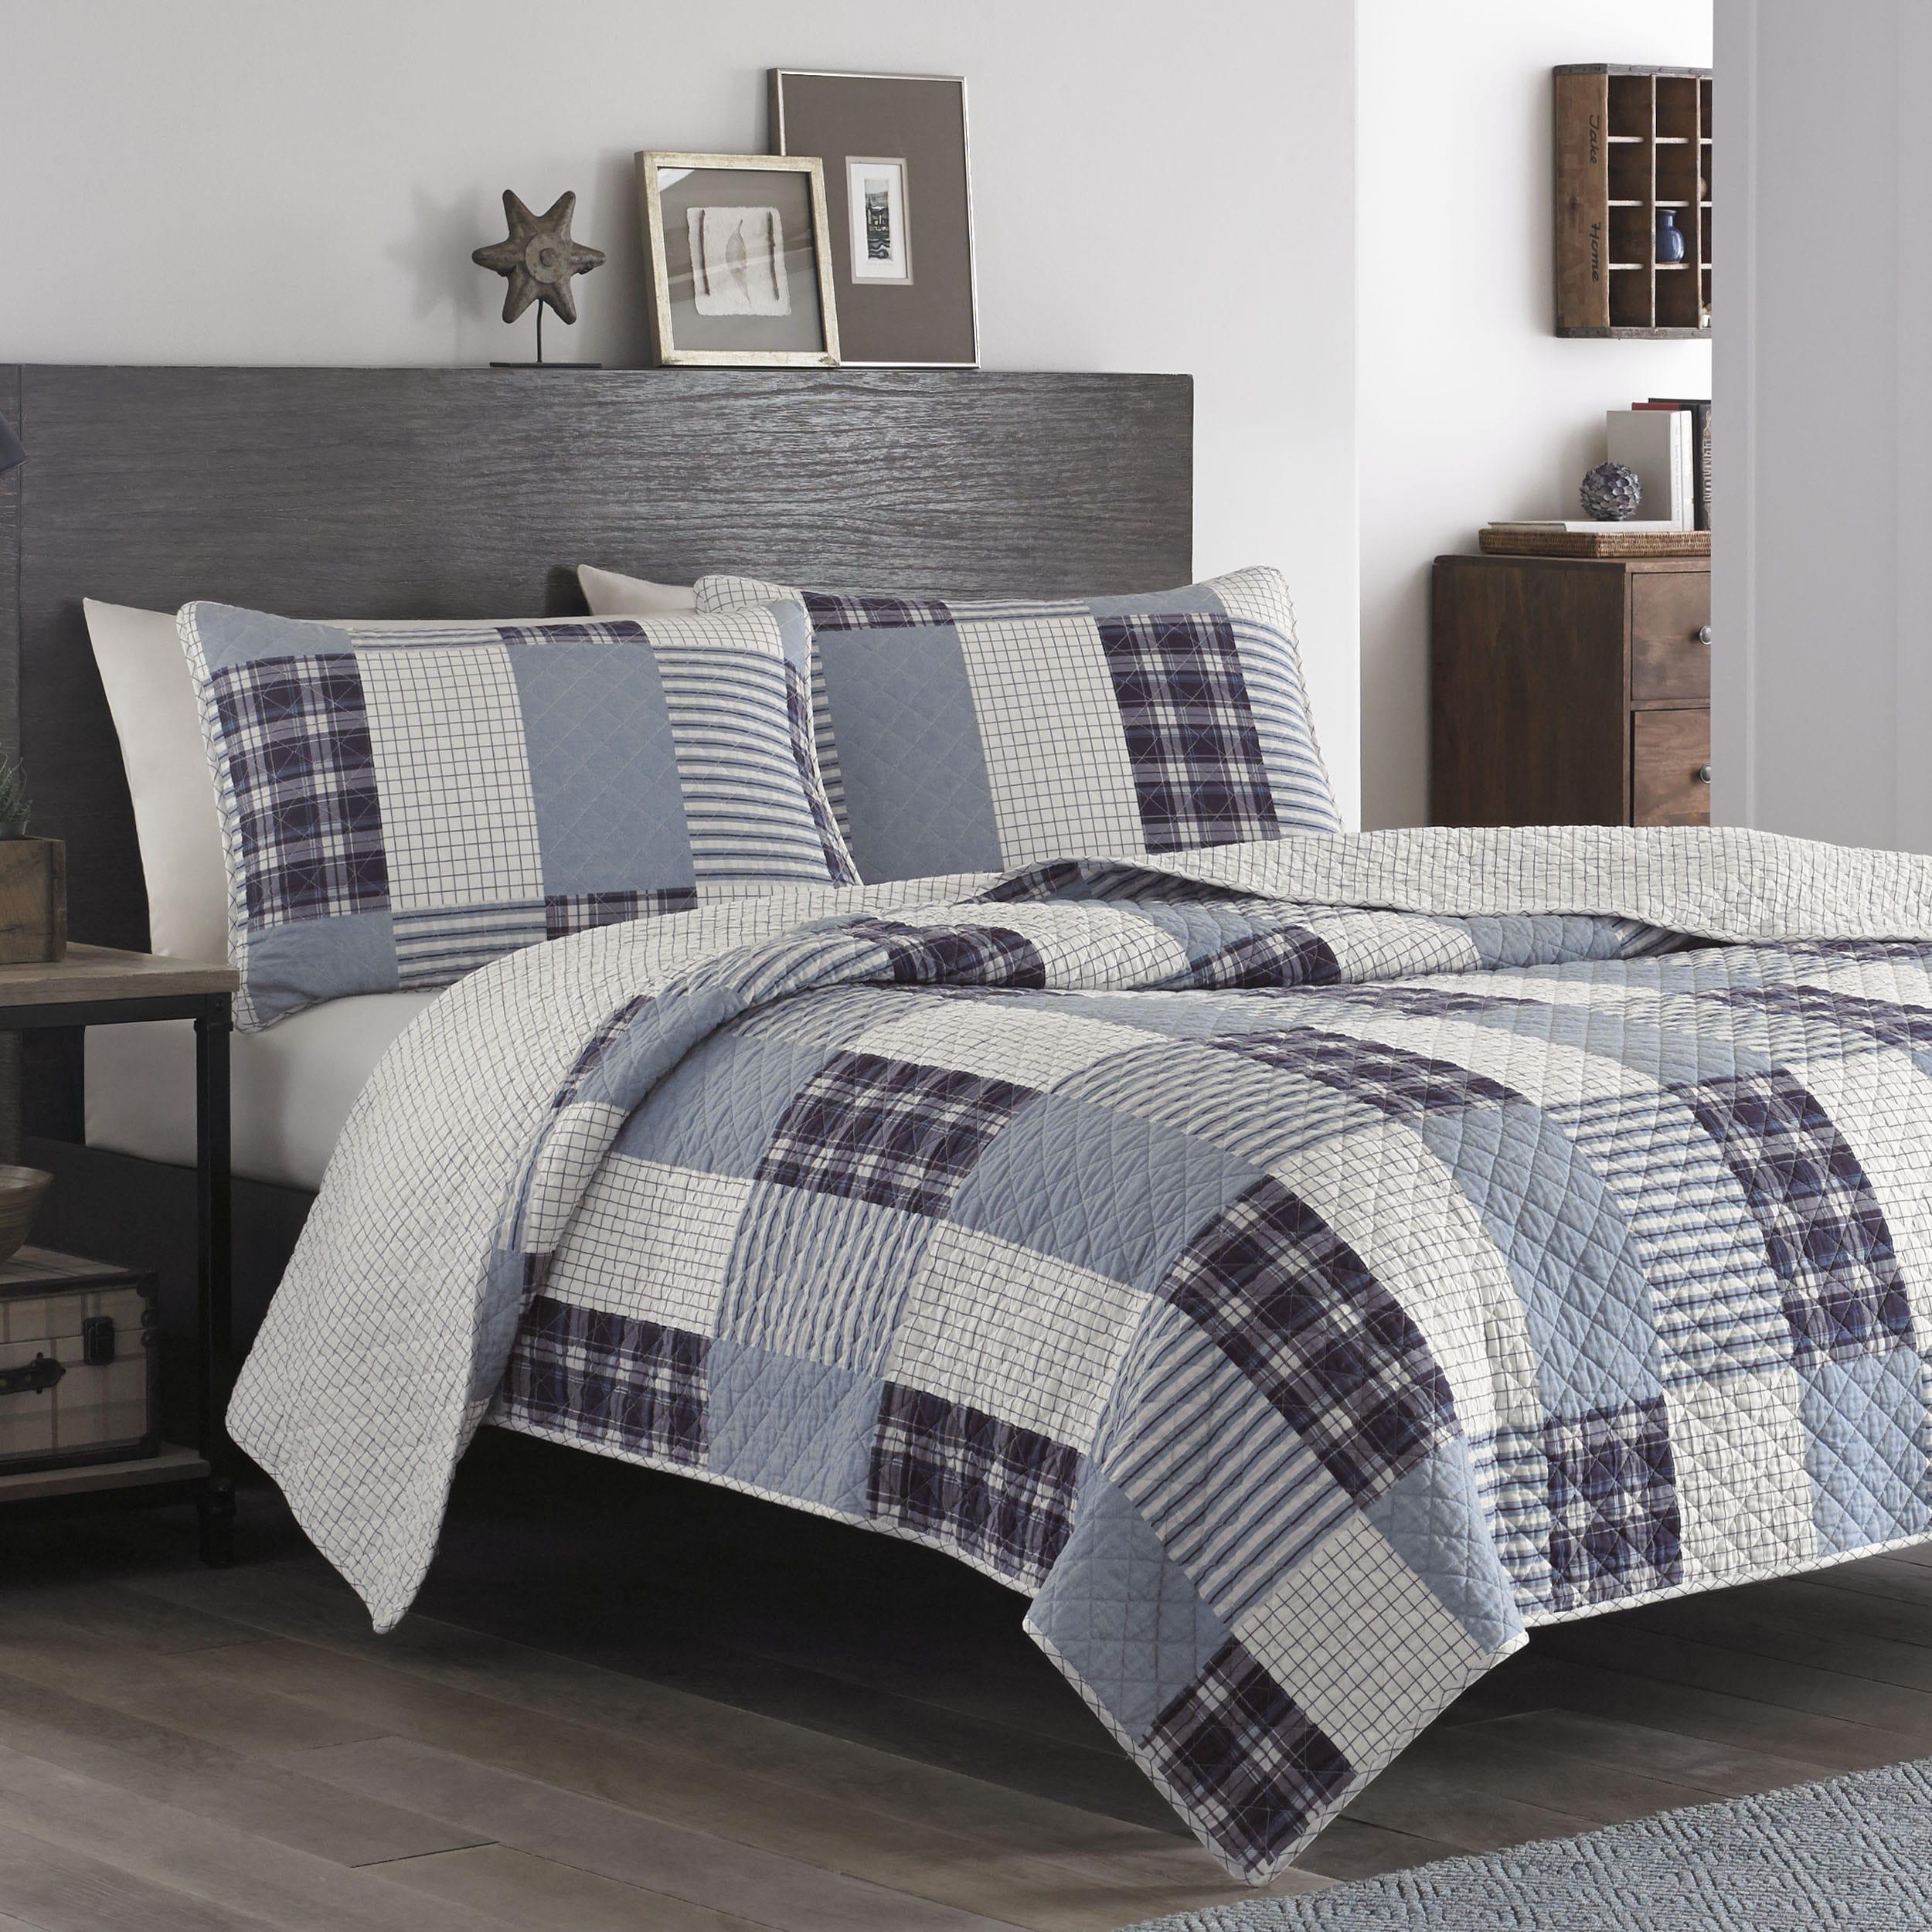 shop cotton fairview alpine quilted at eddie striped bedding bauer bed madrona throw